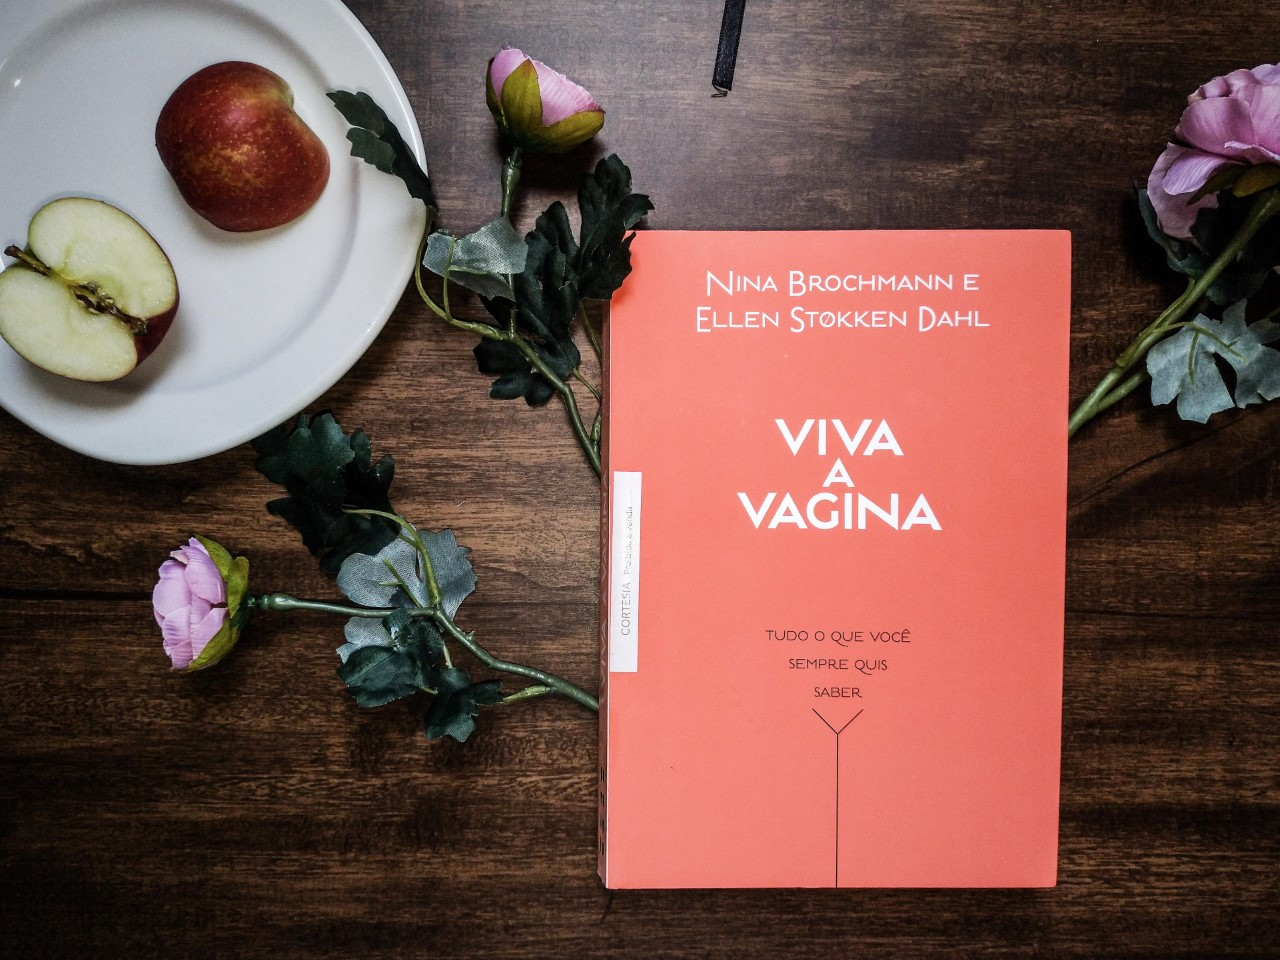 Viva a Vagina: rompendo com os tabus do corpo feminino